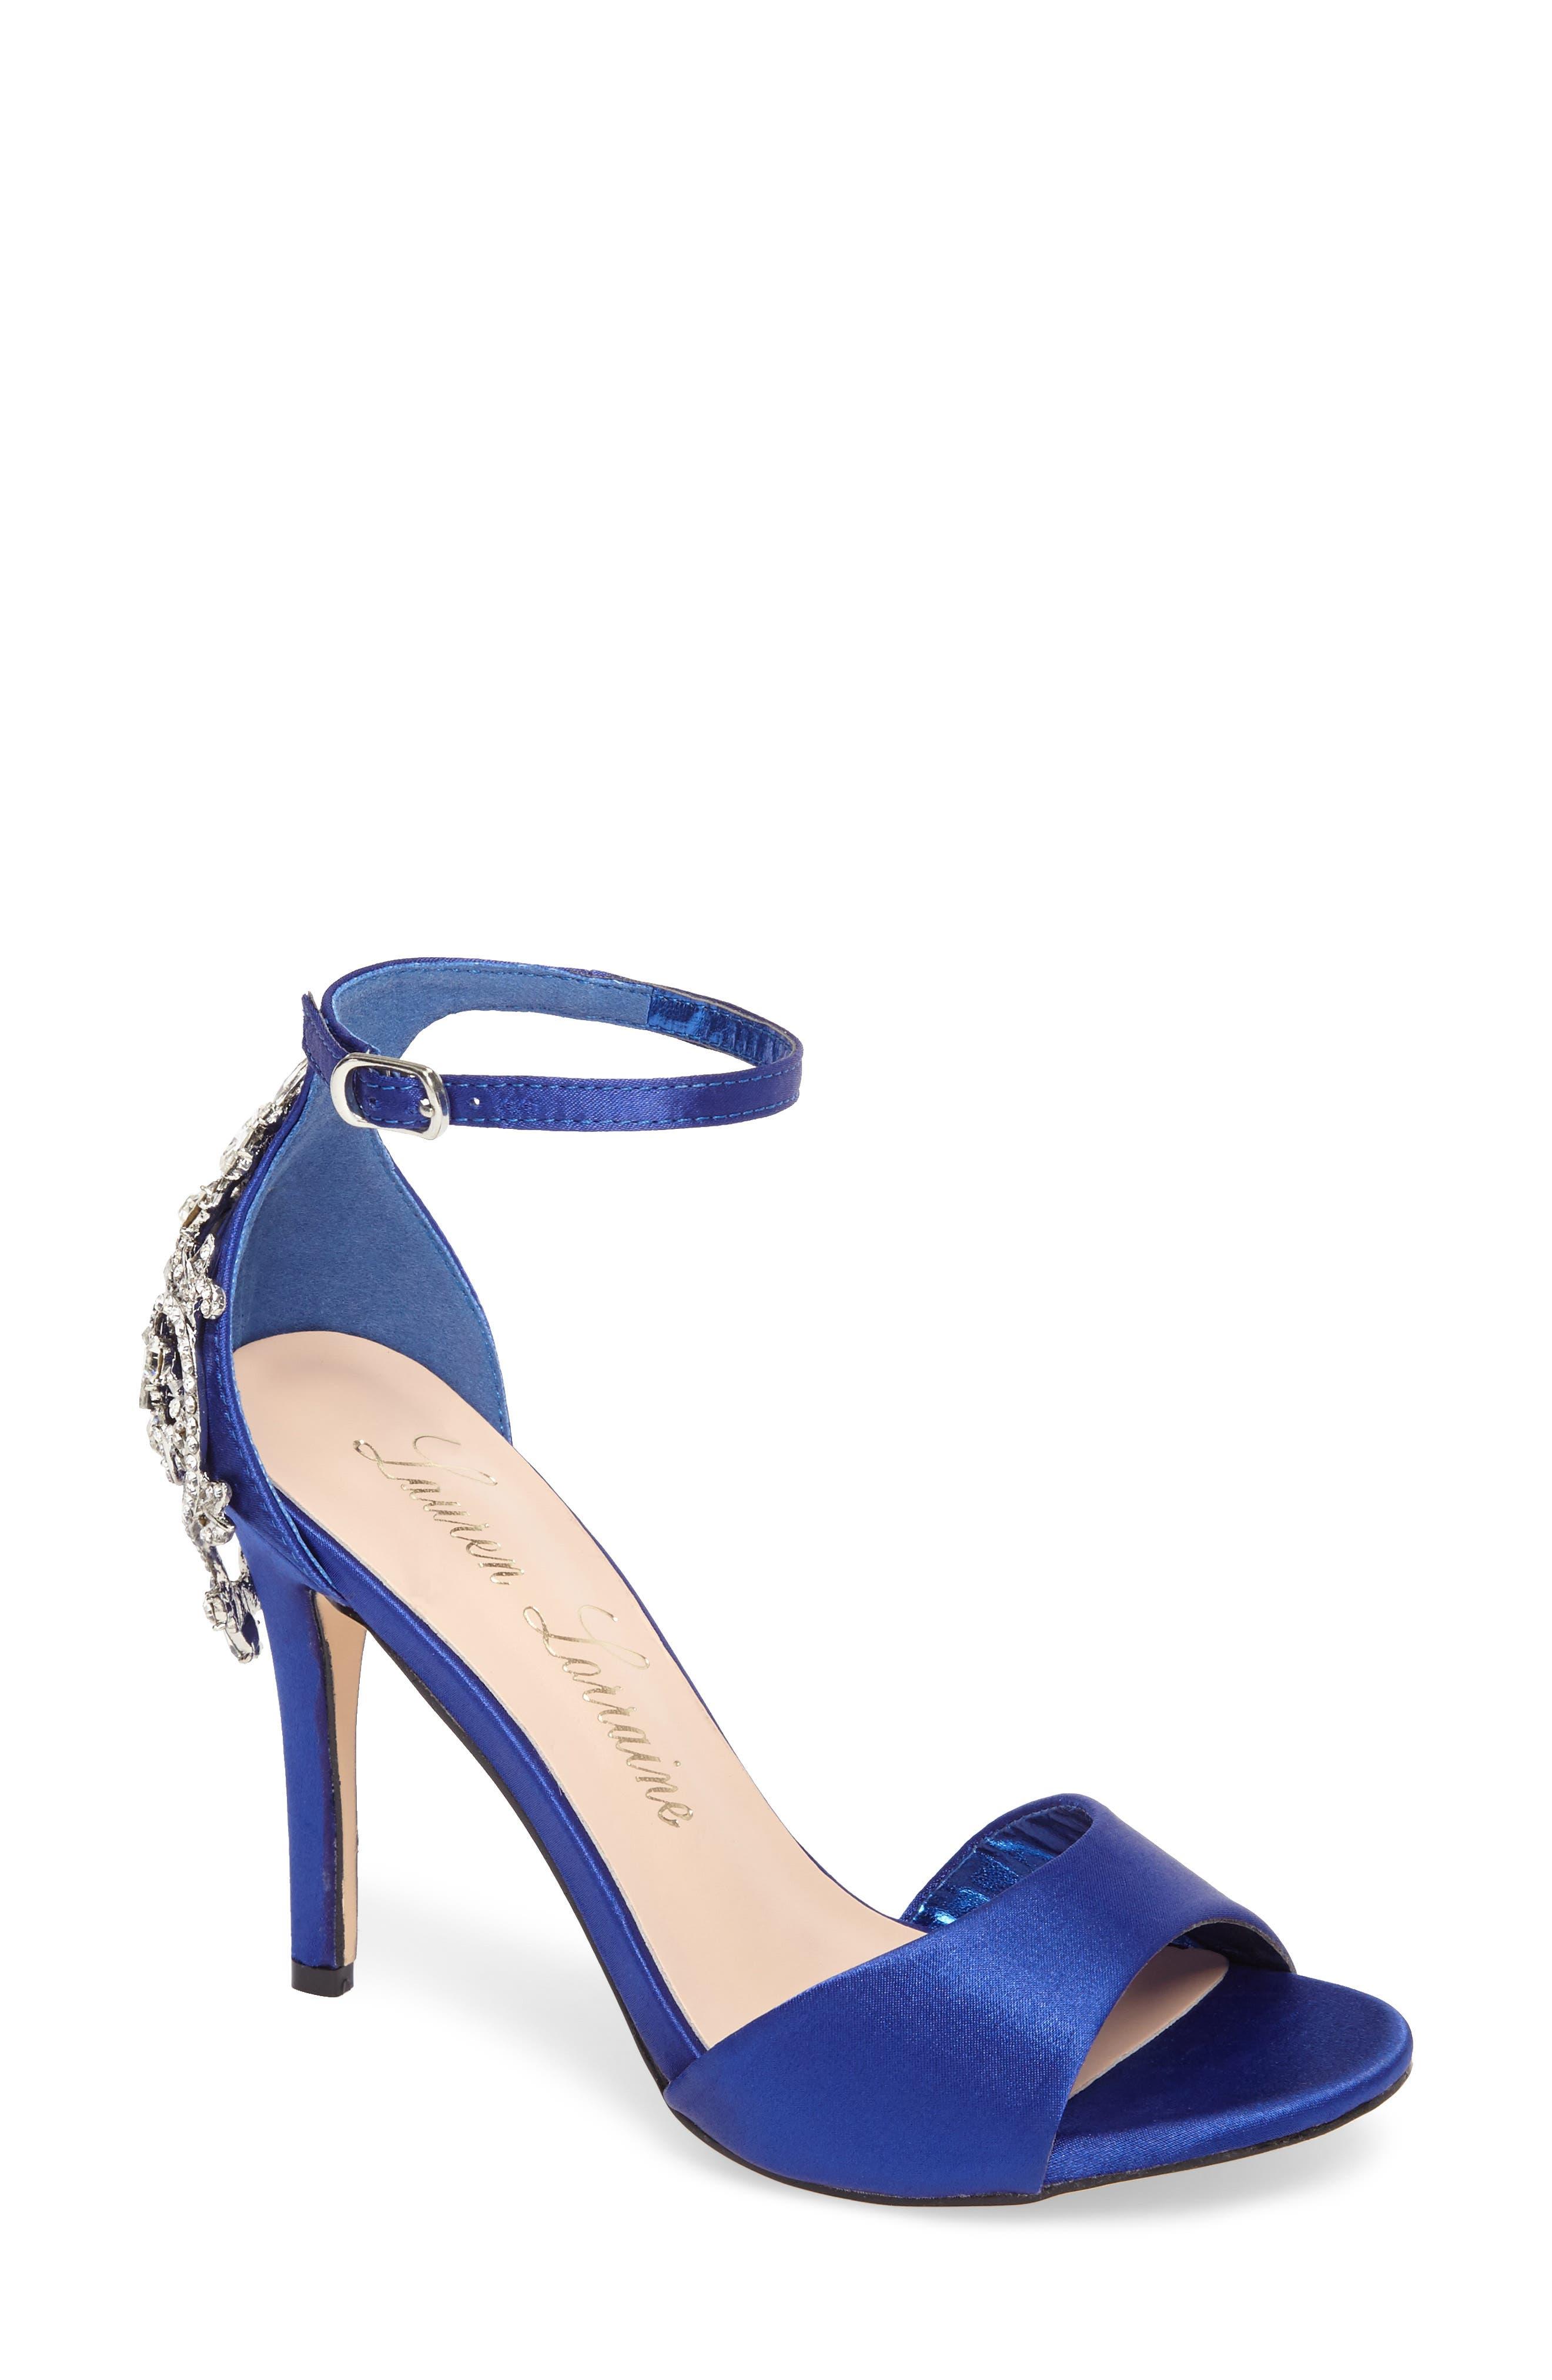 Lauren Lorraine Monet Crystal Embellished Sandal (Women)